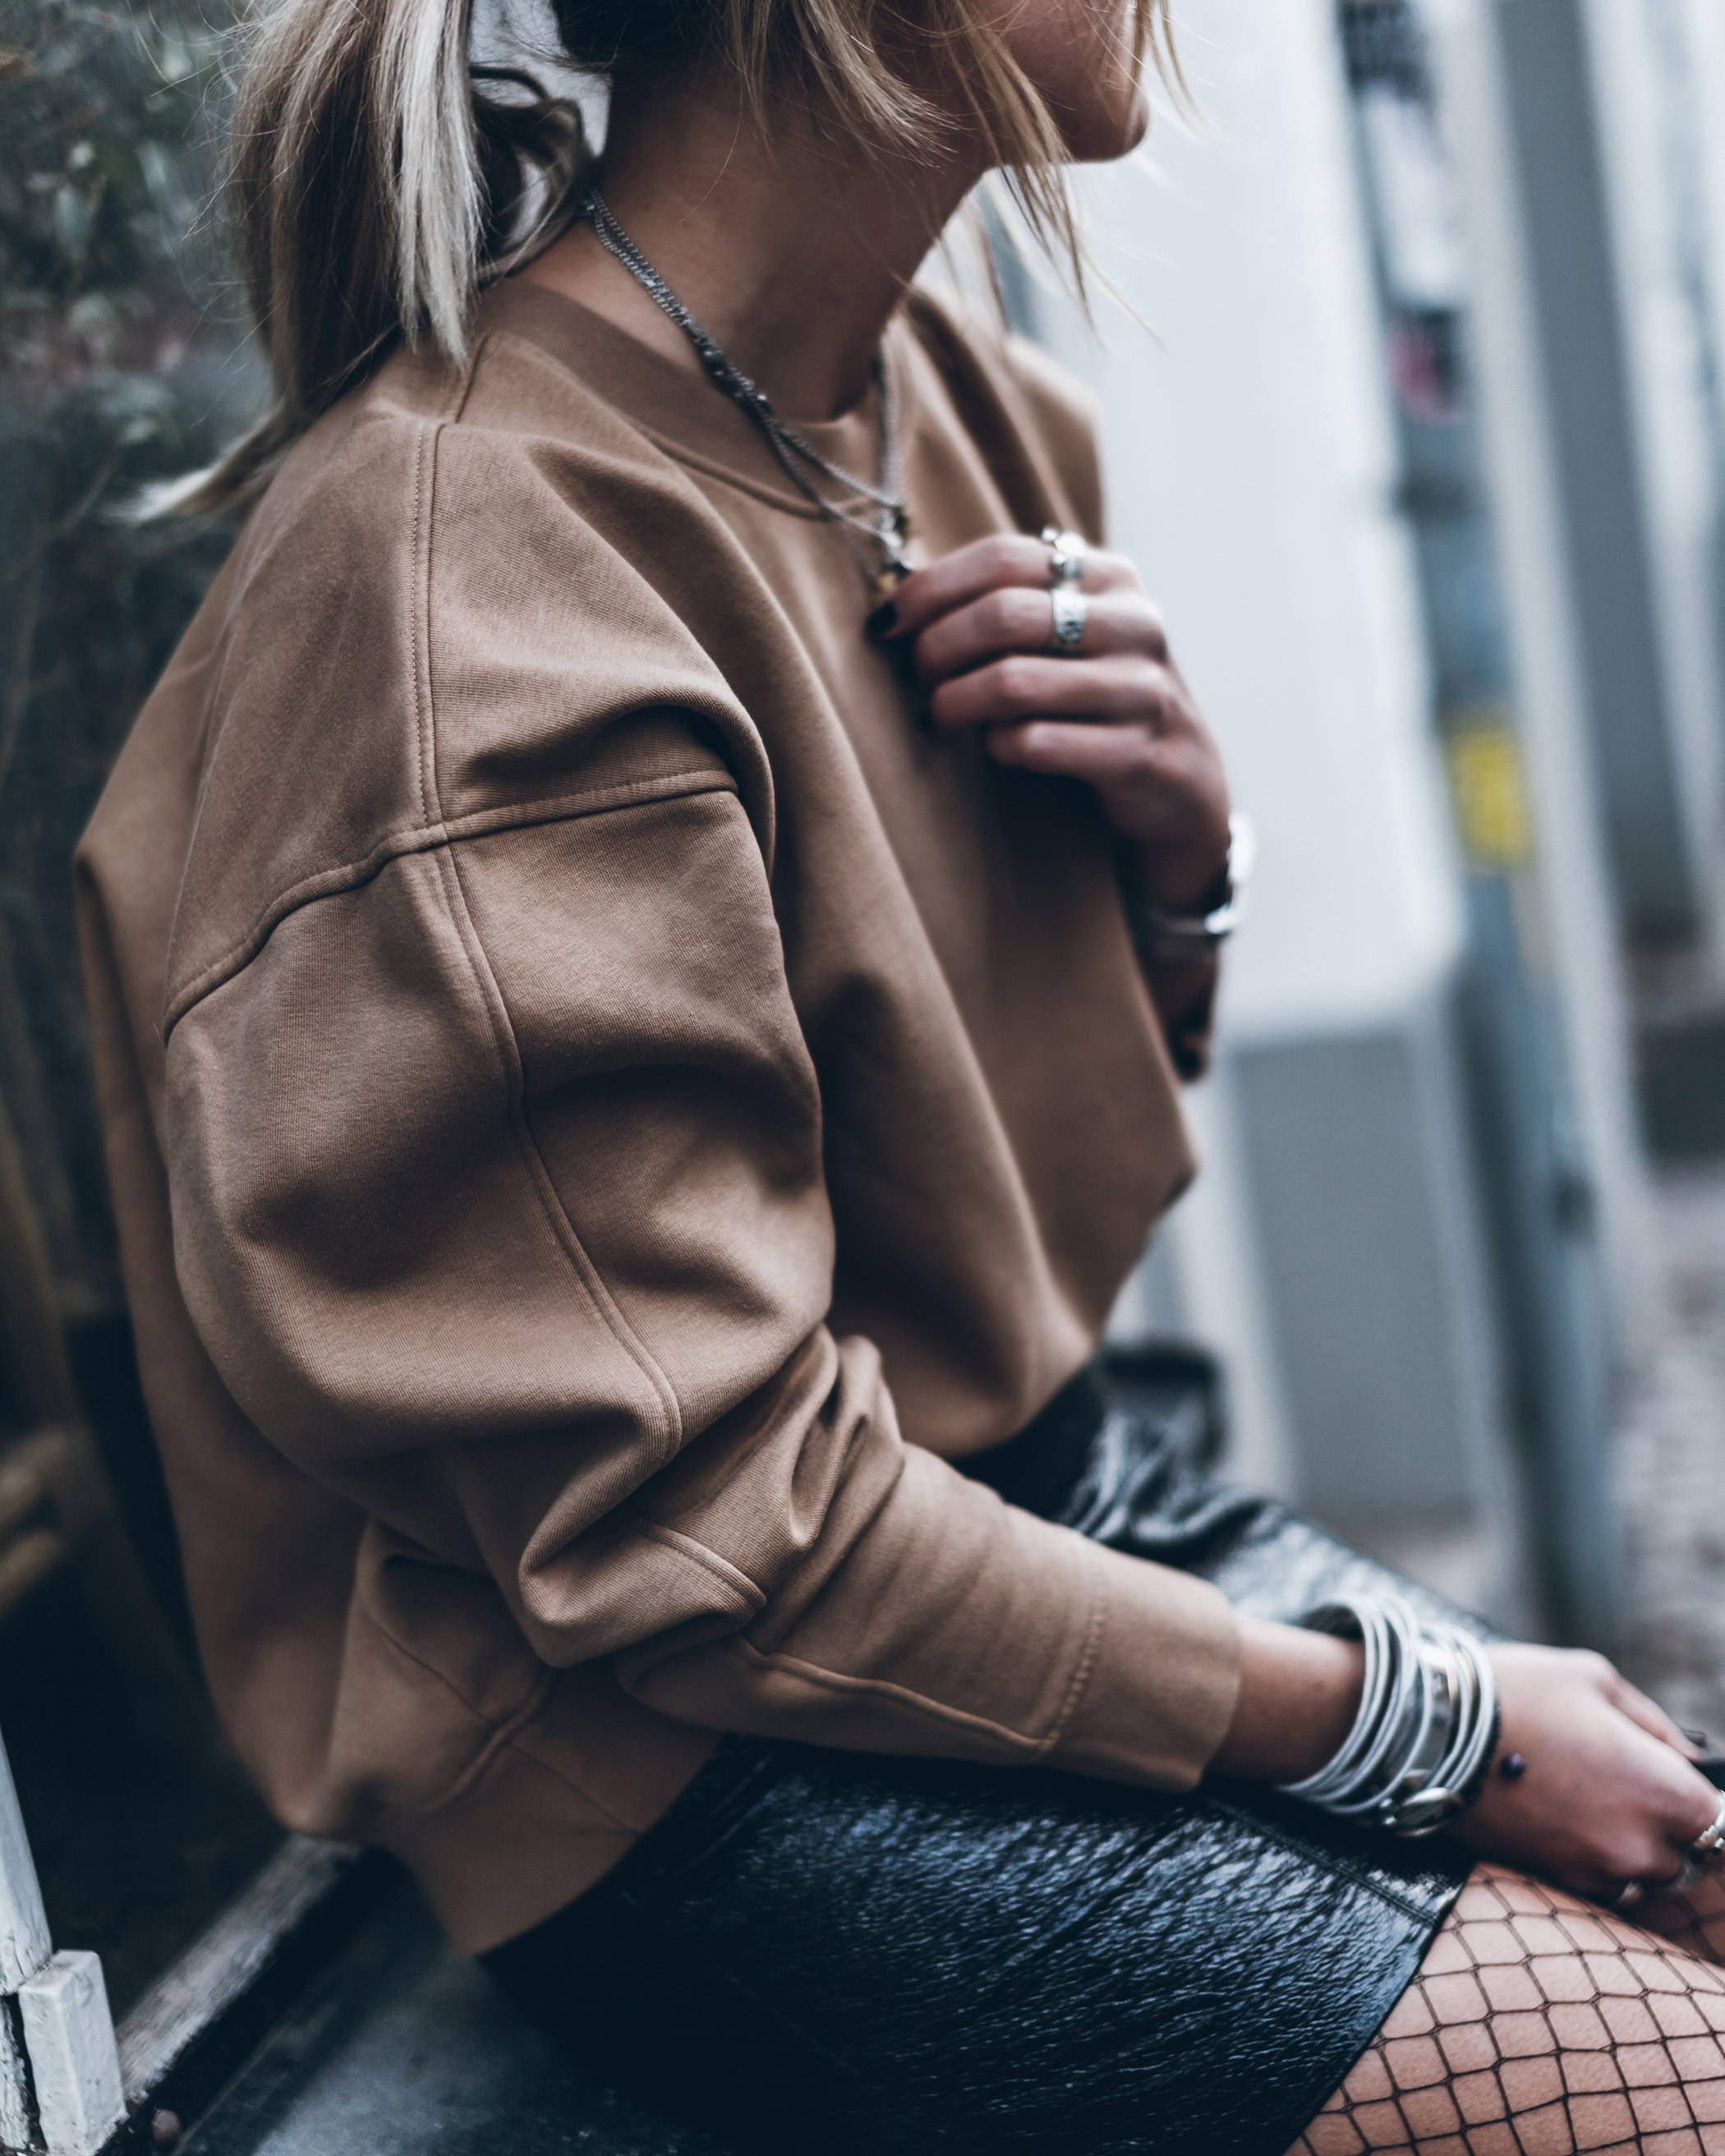 mikuta-patent-leather-skirt-10